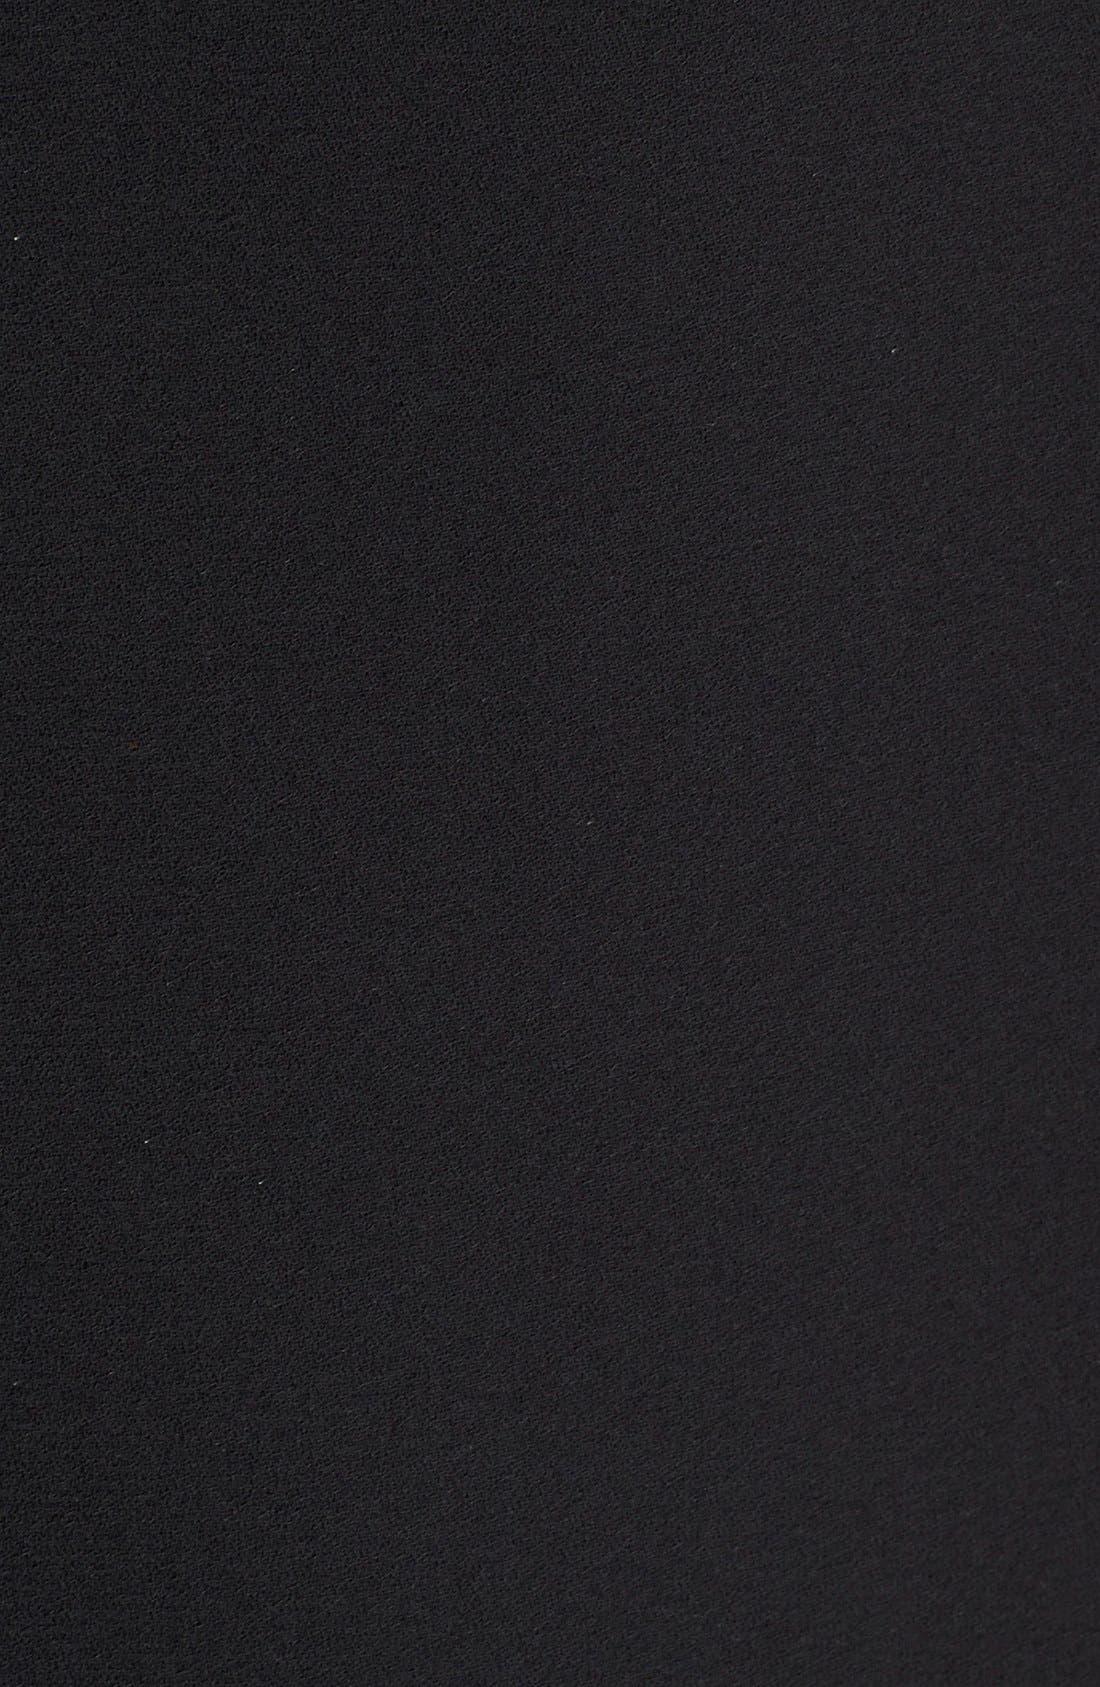 Leather Trim Trapeze Crepe Dress,                             Alternate thumbnail 5, color,